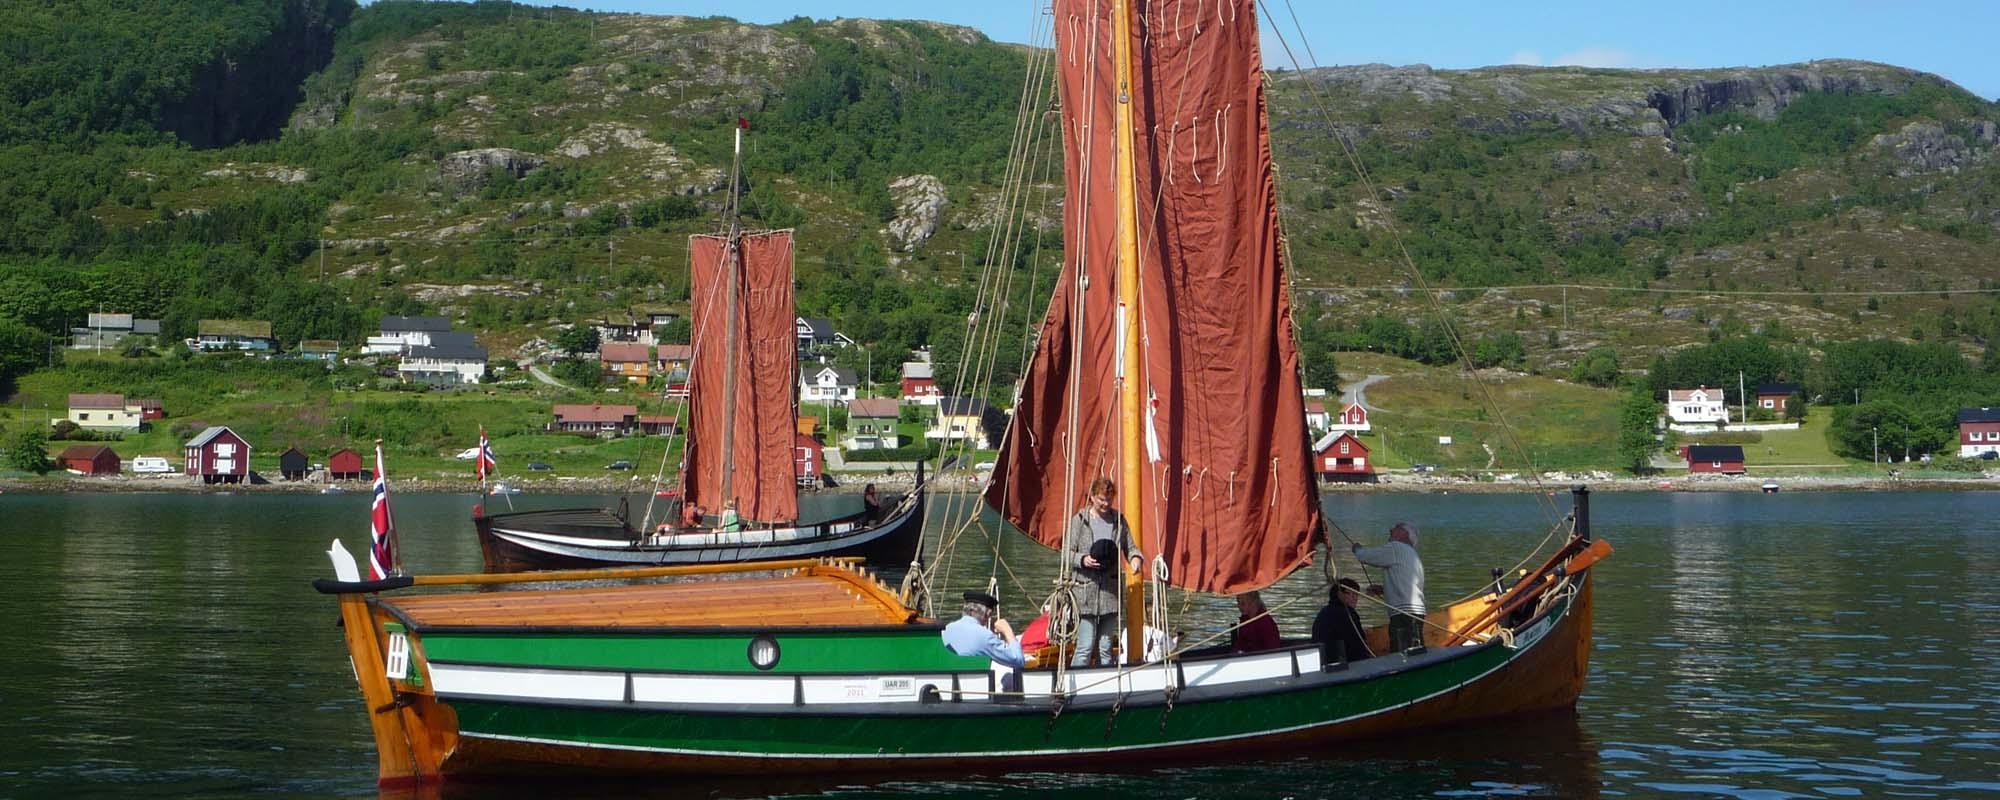 Åfjordsbåten Kystlag